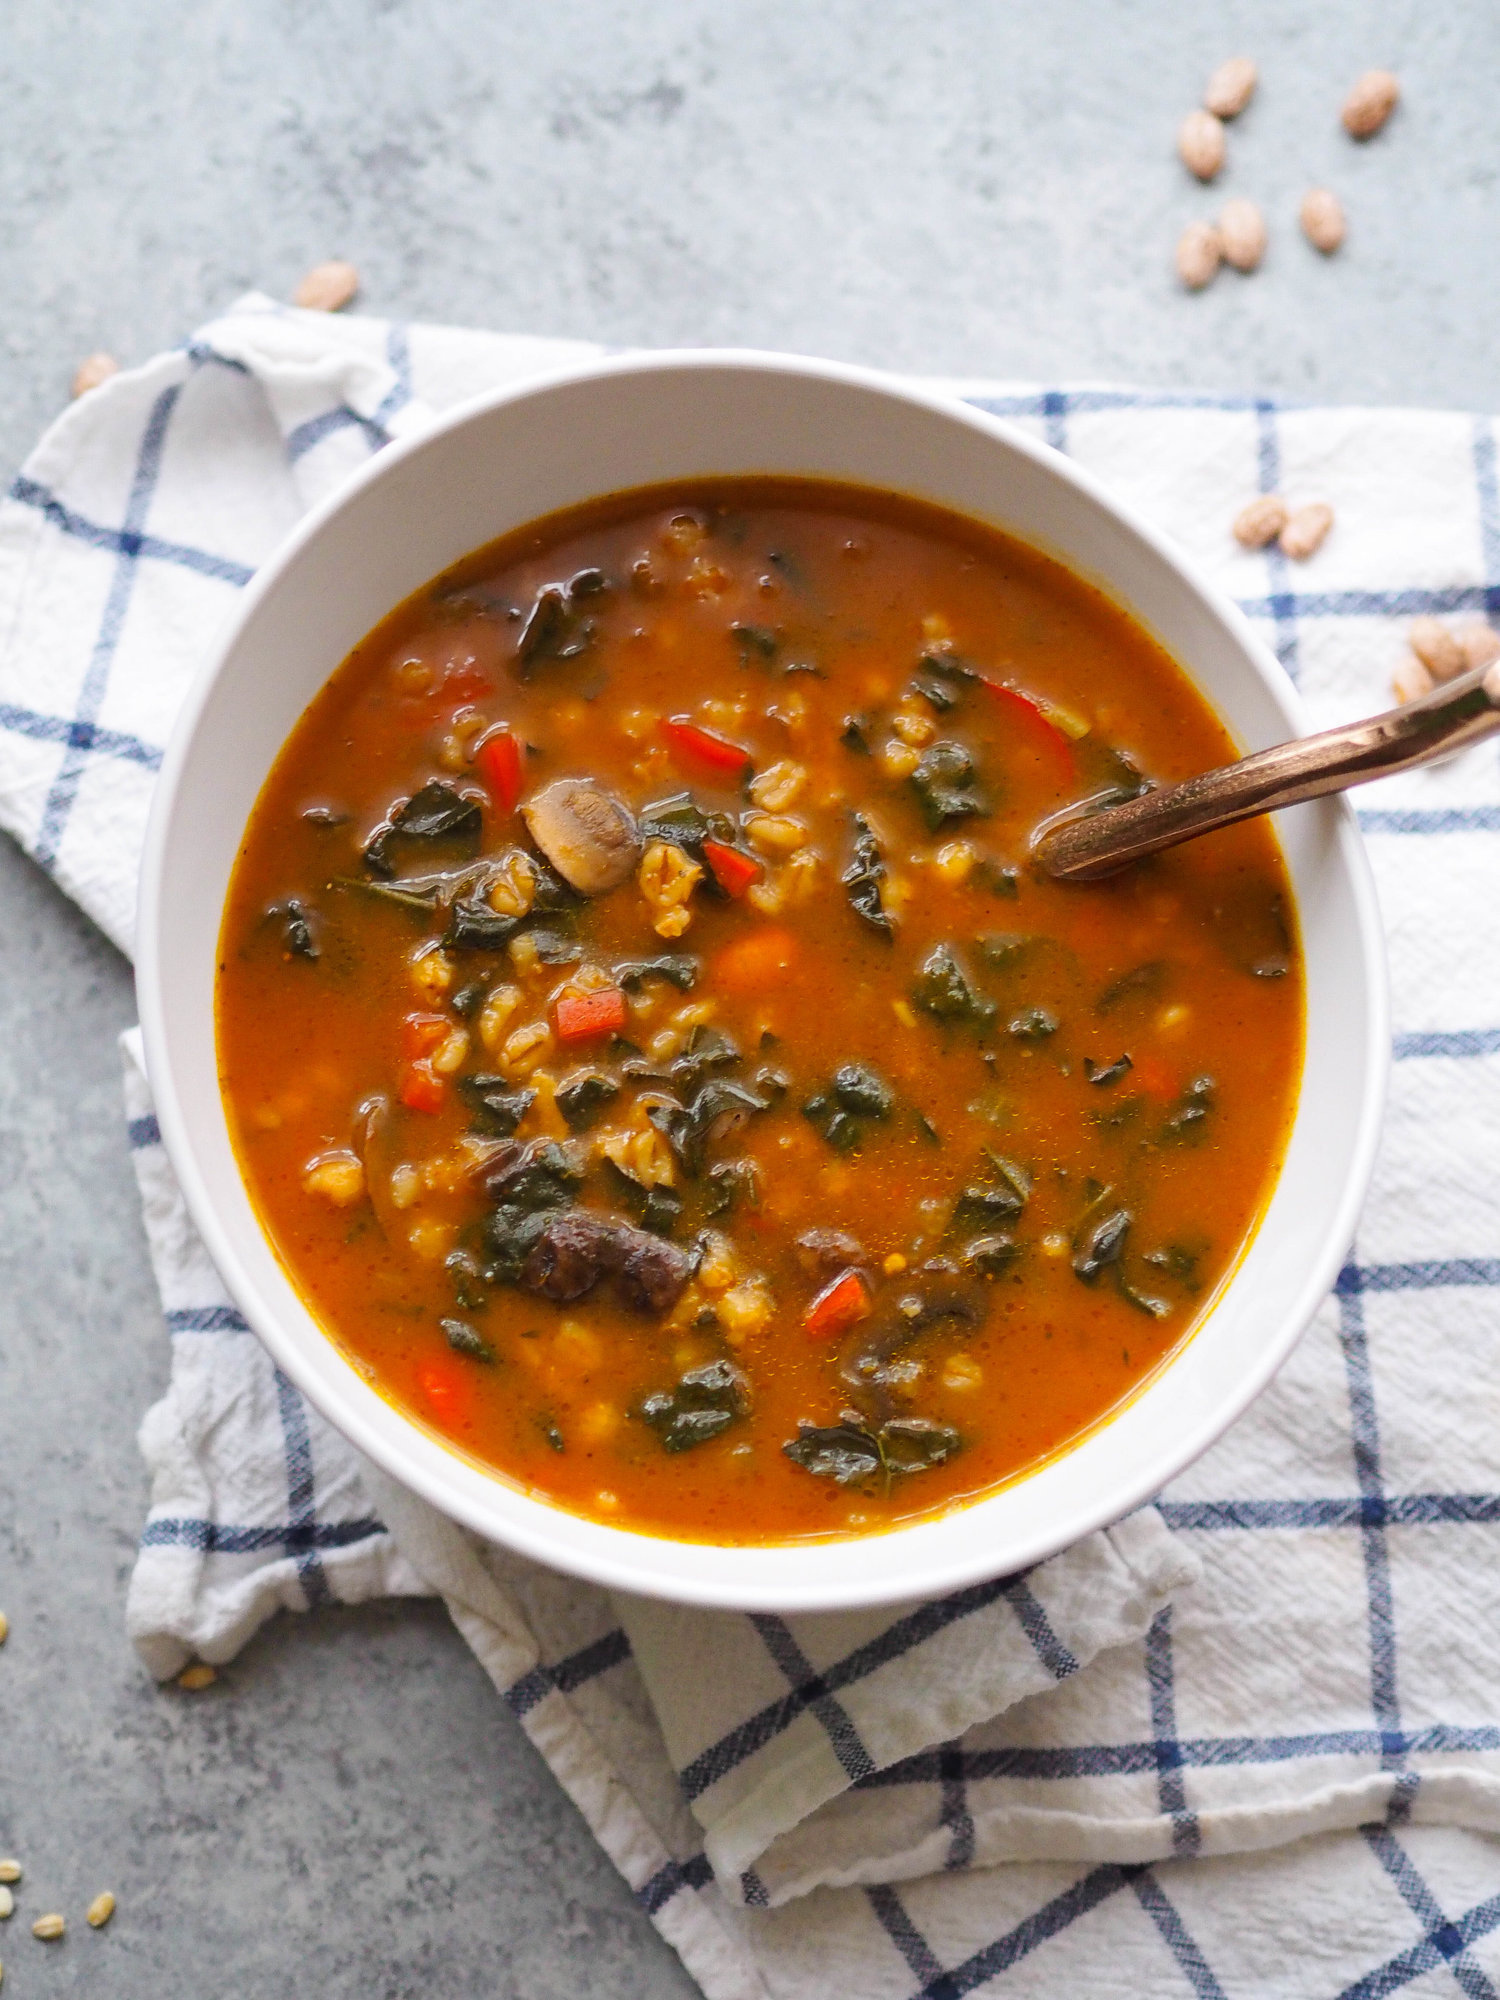 Instant Pot Vegan Mushroom Barley Soup with Pumpkin Recipe